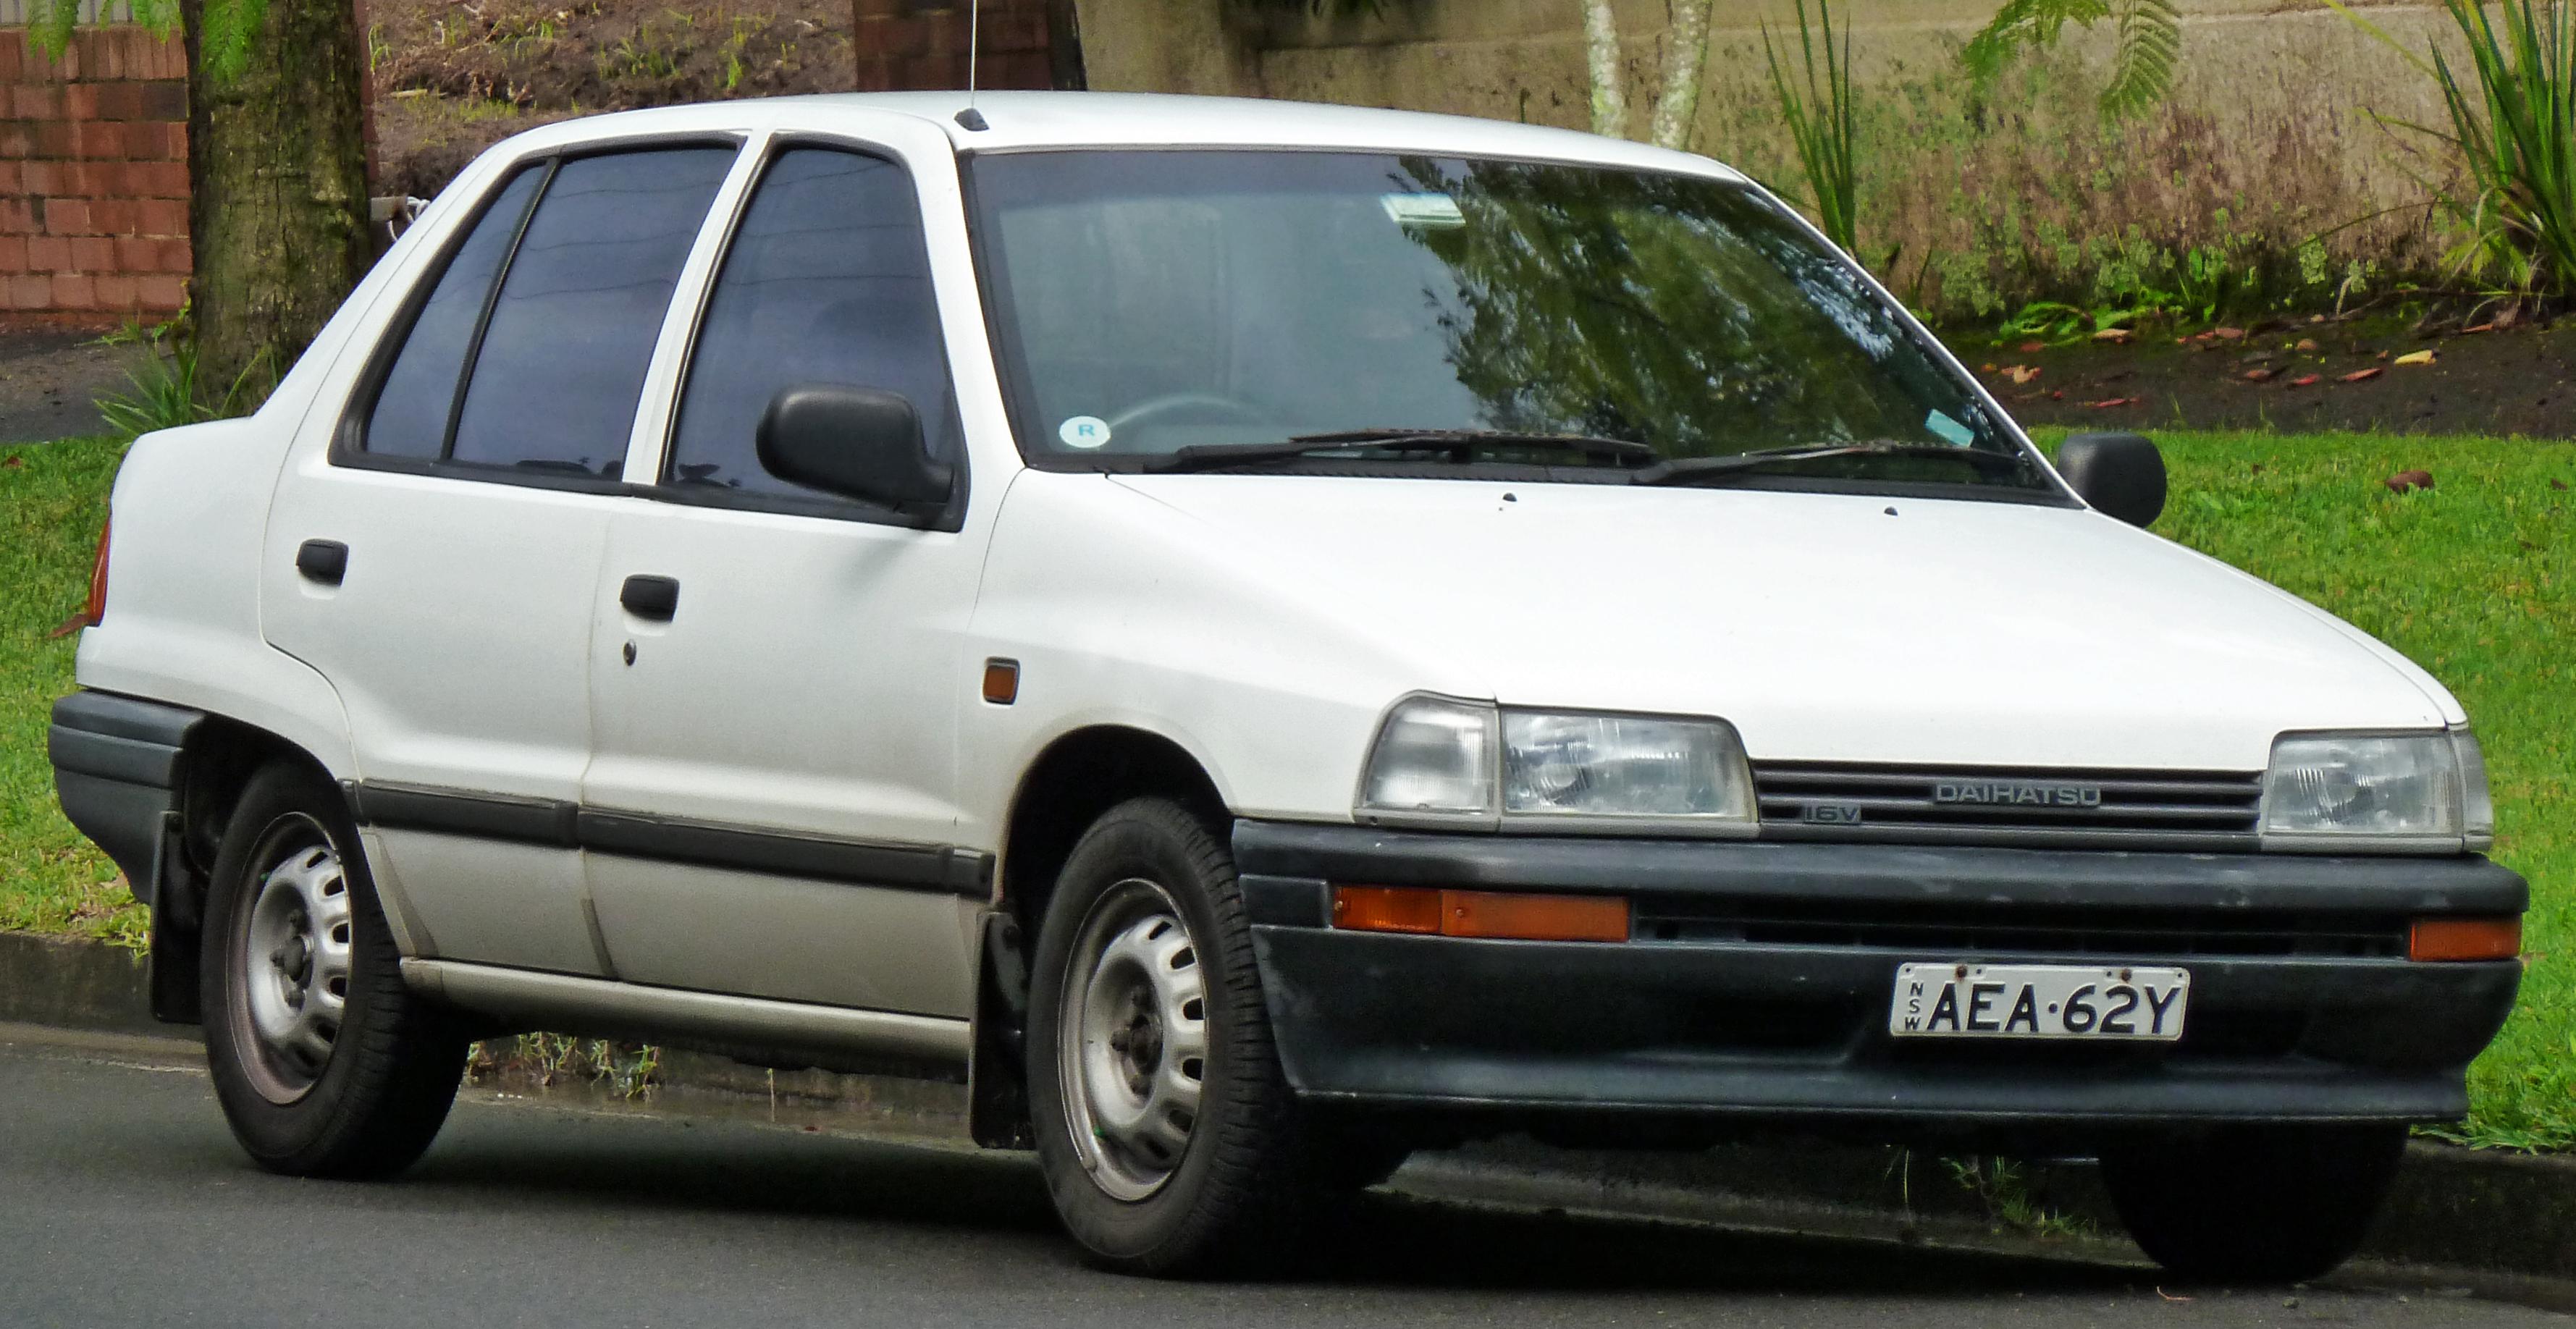 Daihatsu Charade IV Restyling 1996 - 2000 Hatchback 5 door #2